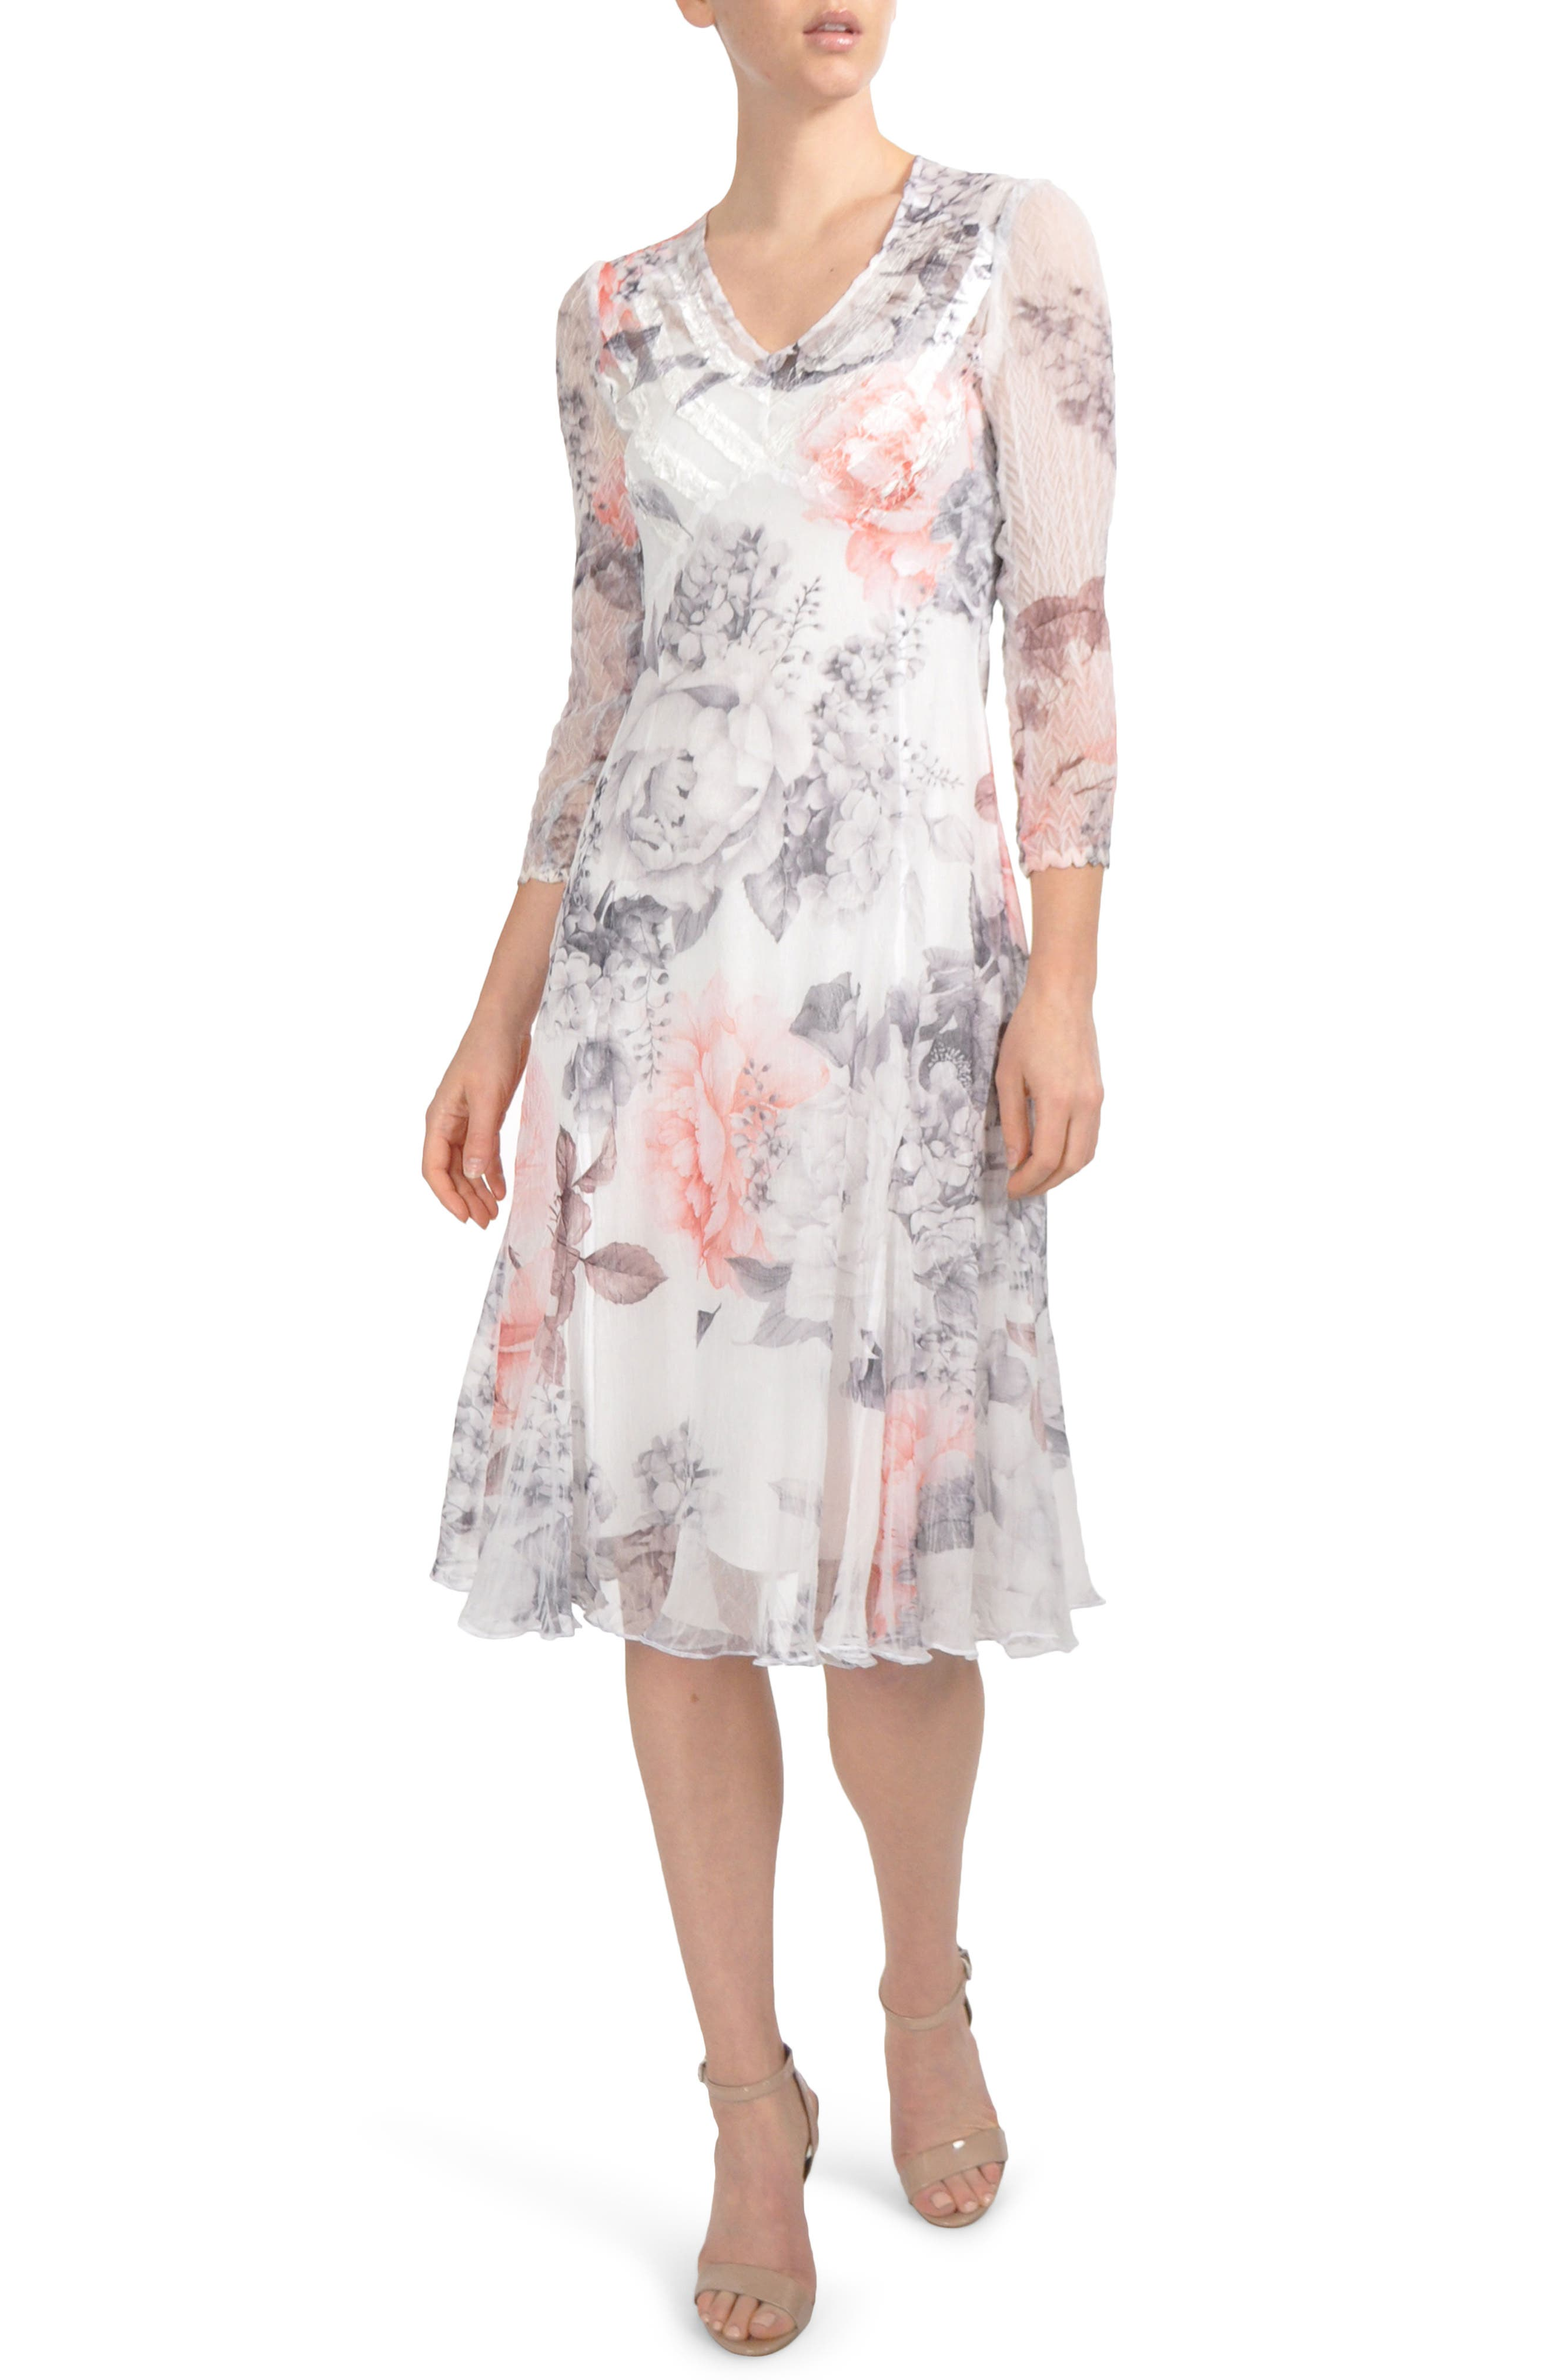 Alternate Image 1 Selected - Komarov Floral Chiffon Tea Length Dress (Regular & Petite)